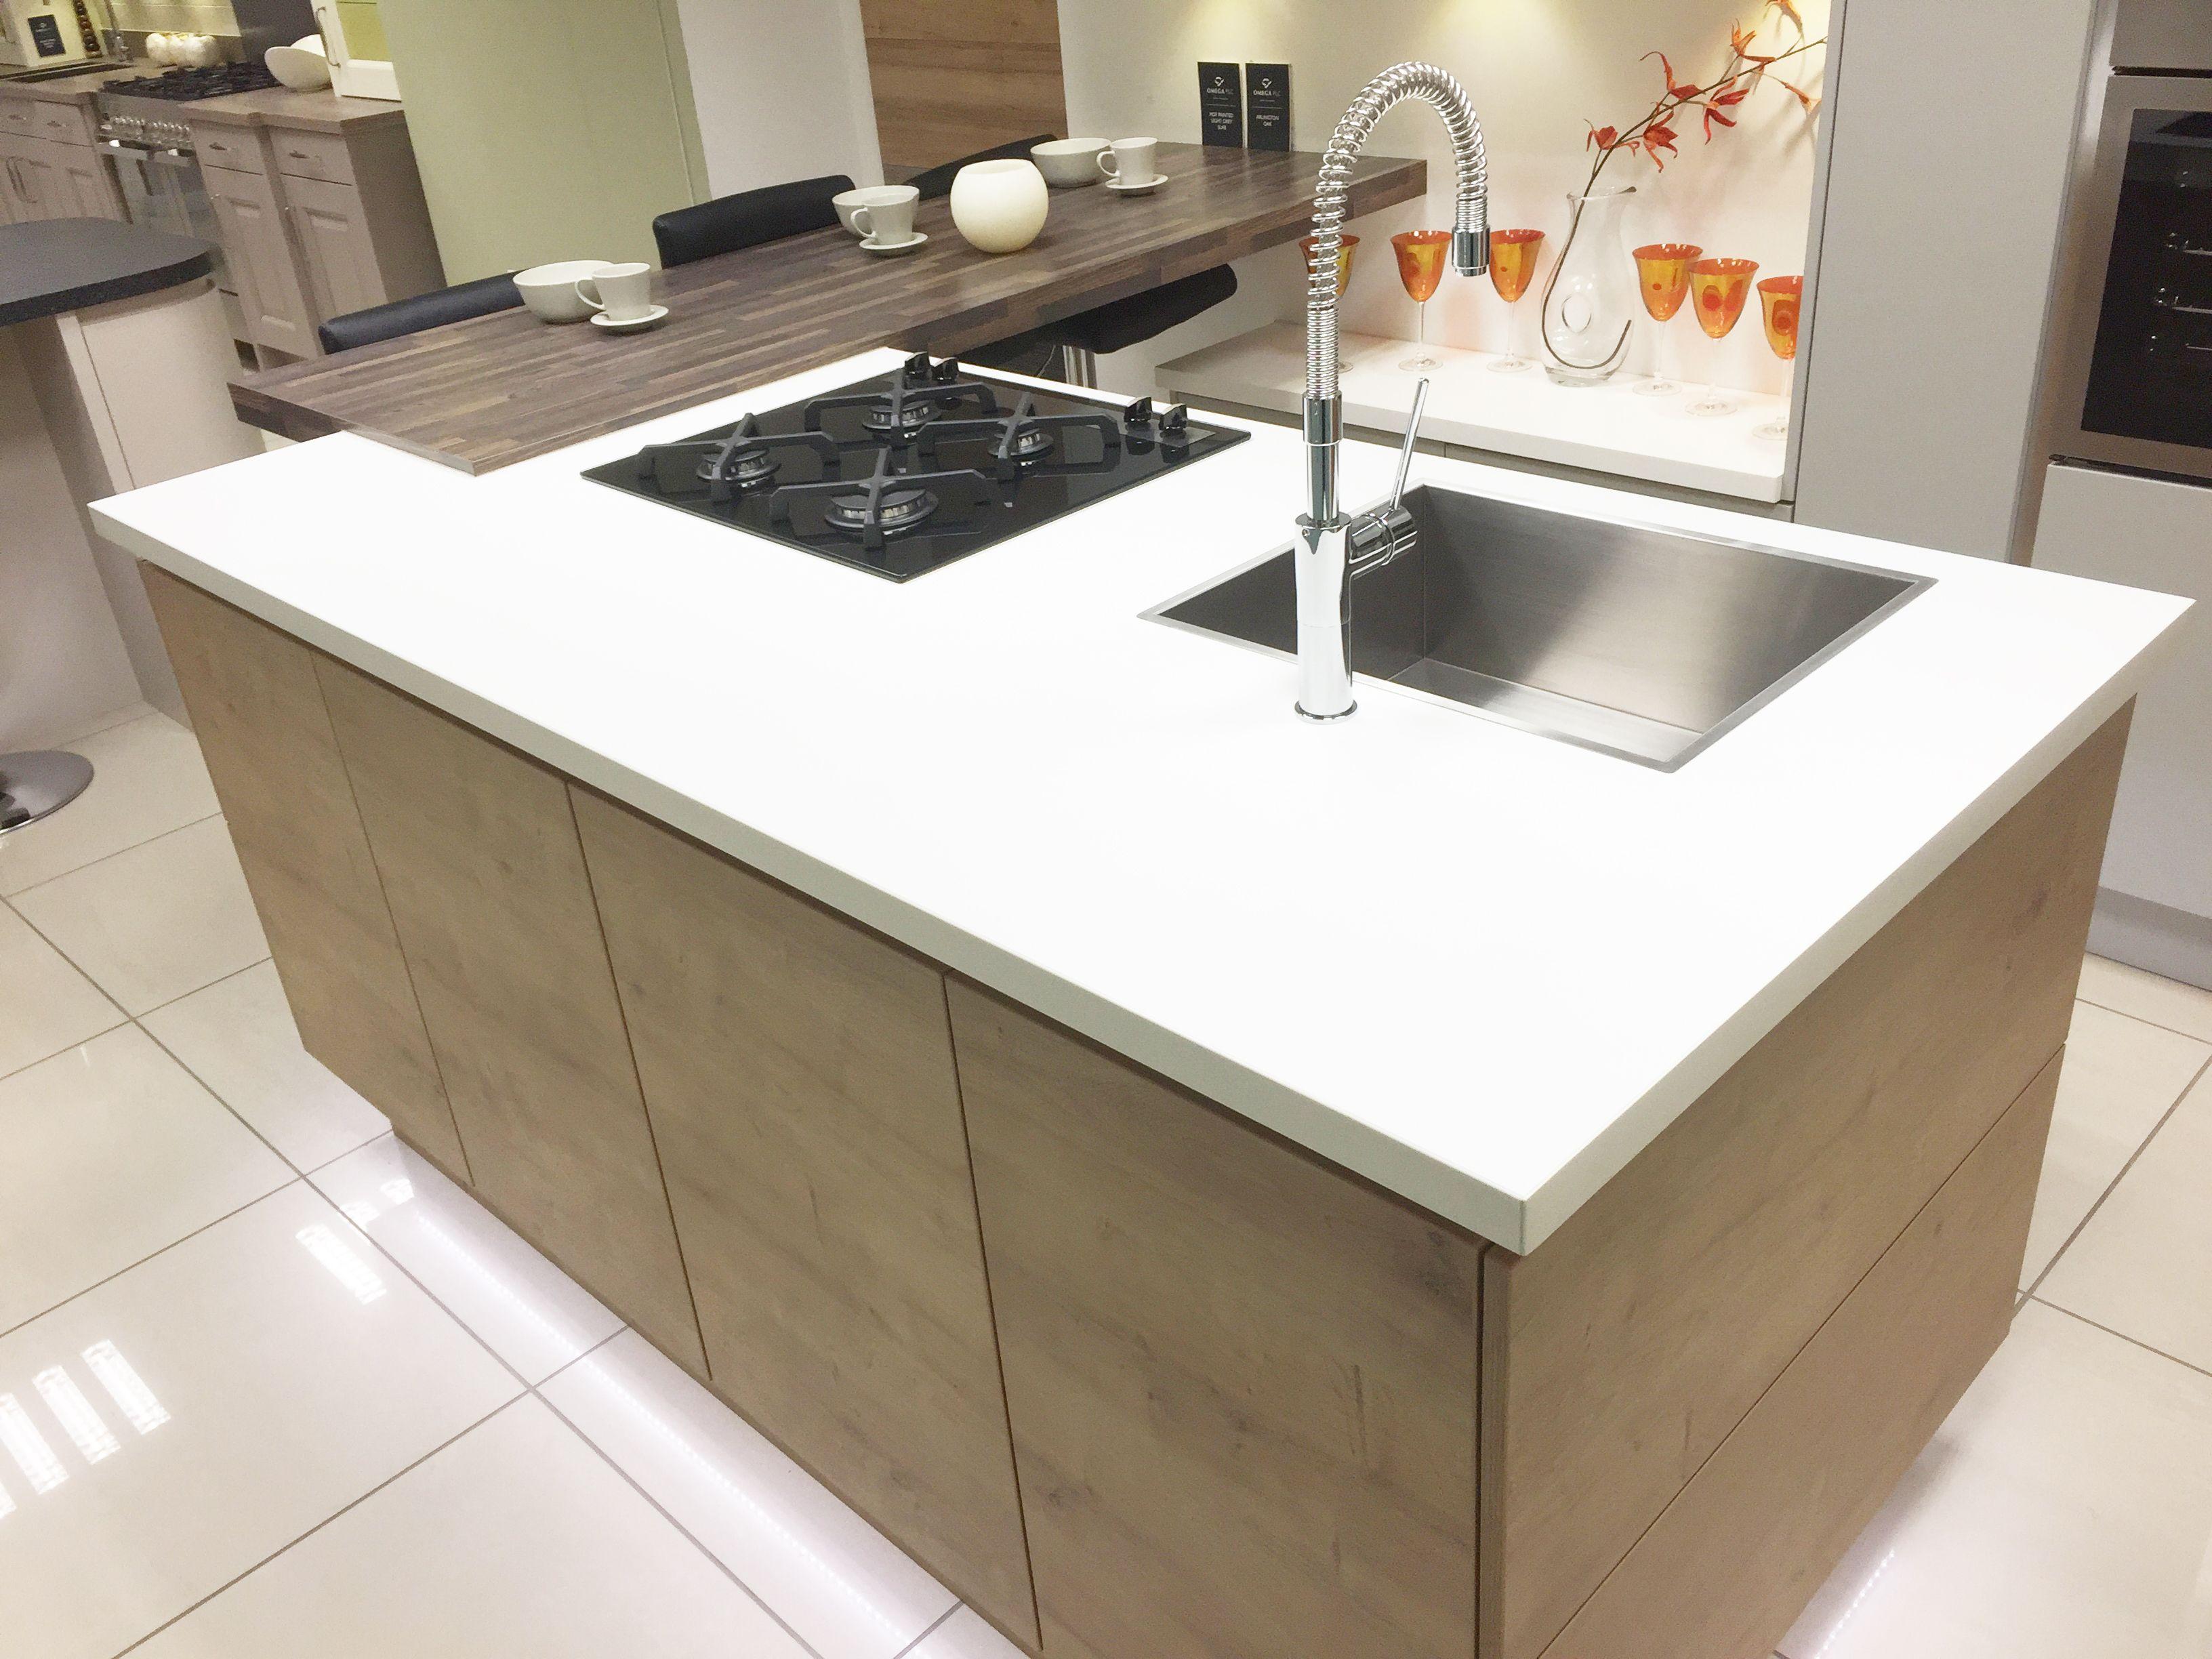 Modern kitchen island with hob, sink and breakfast bar